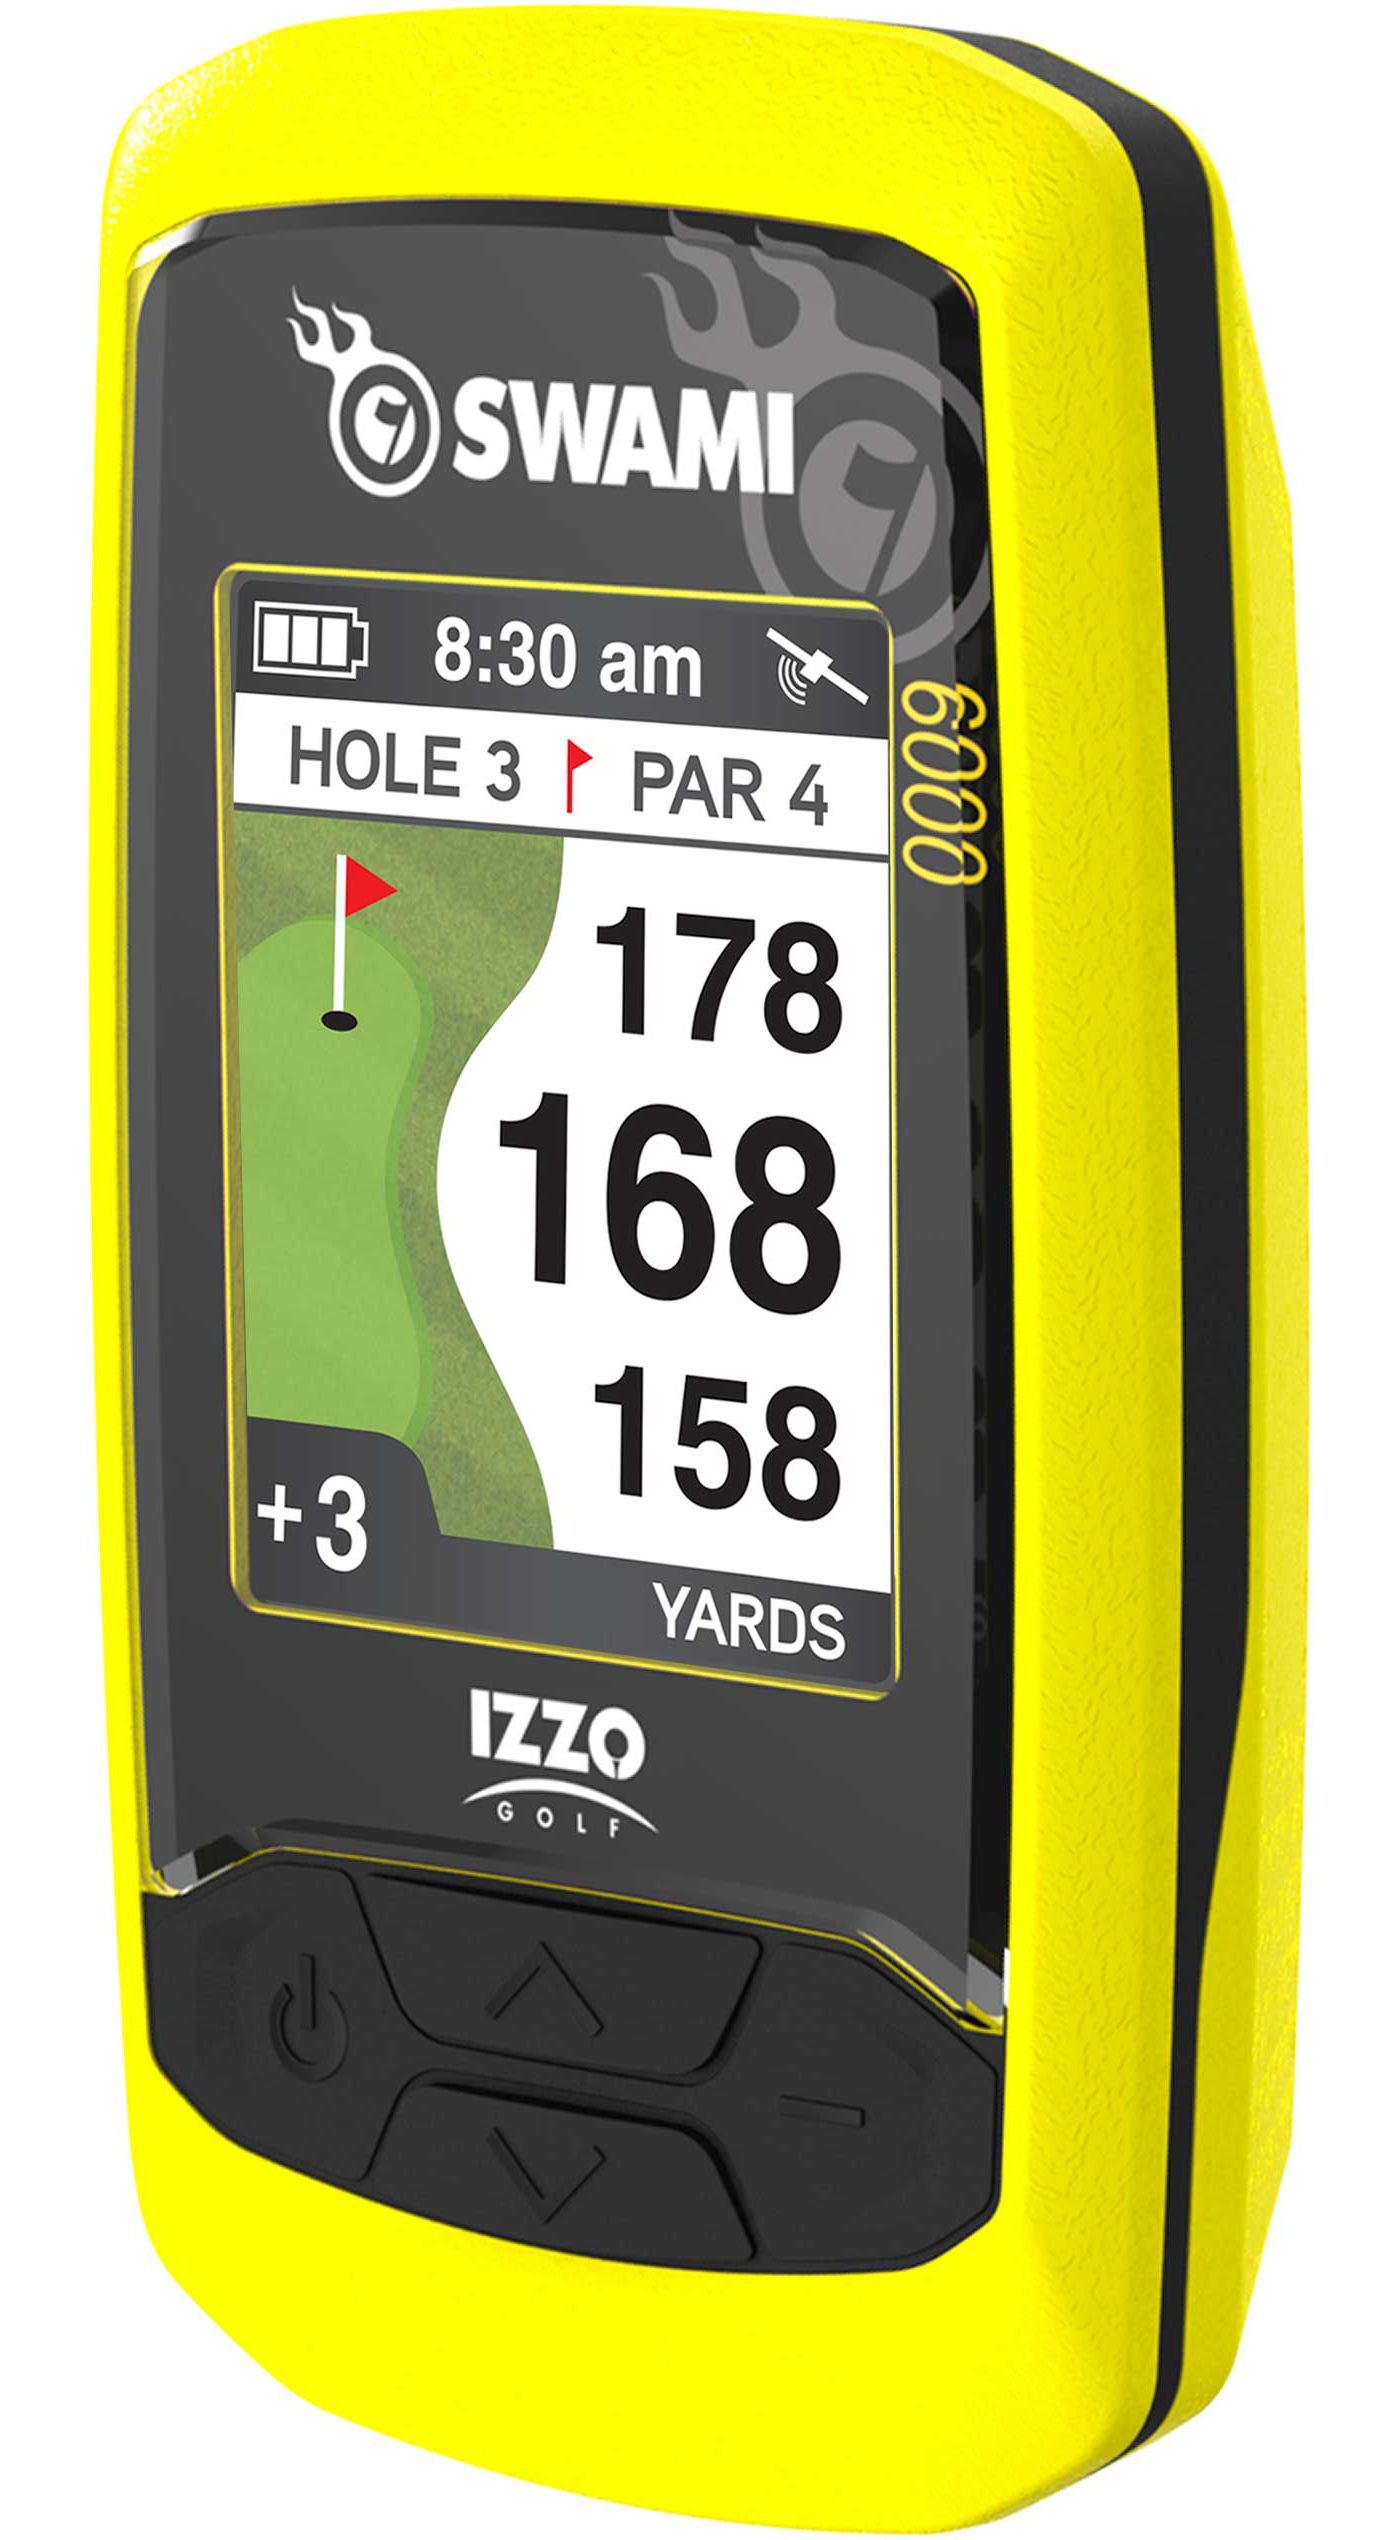 Izzo Golf Swami 6000 Golf GPS